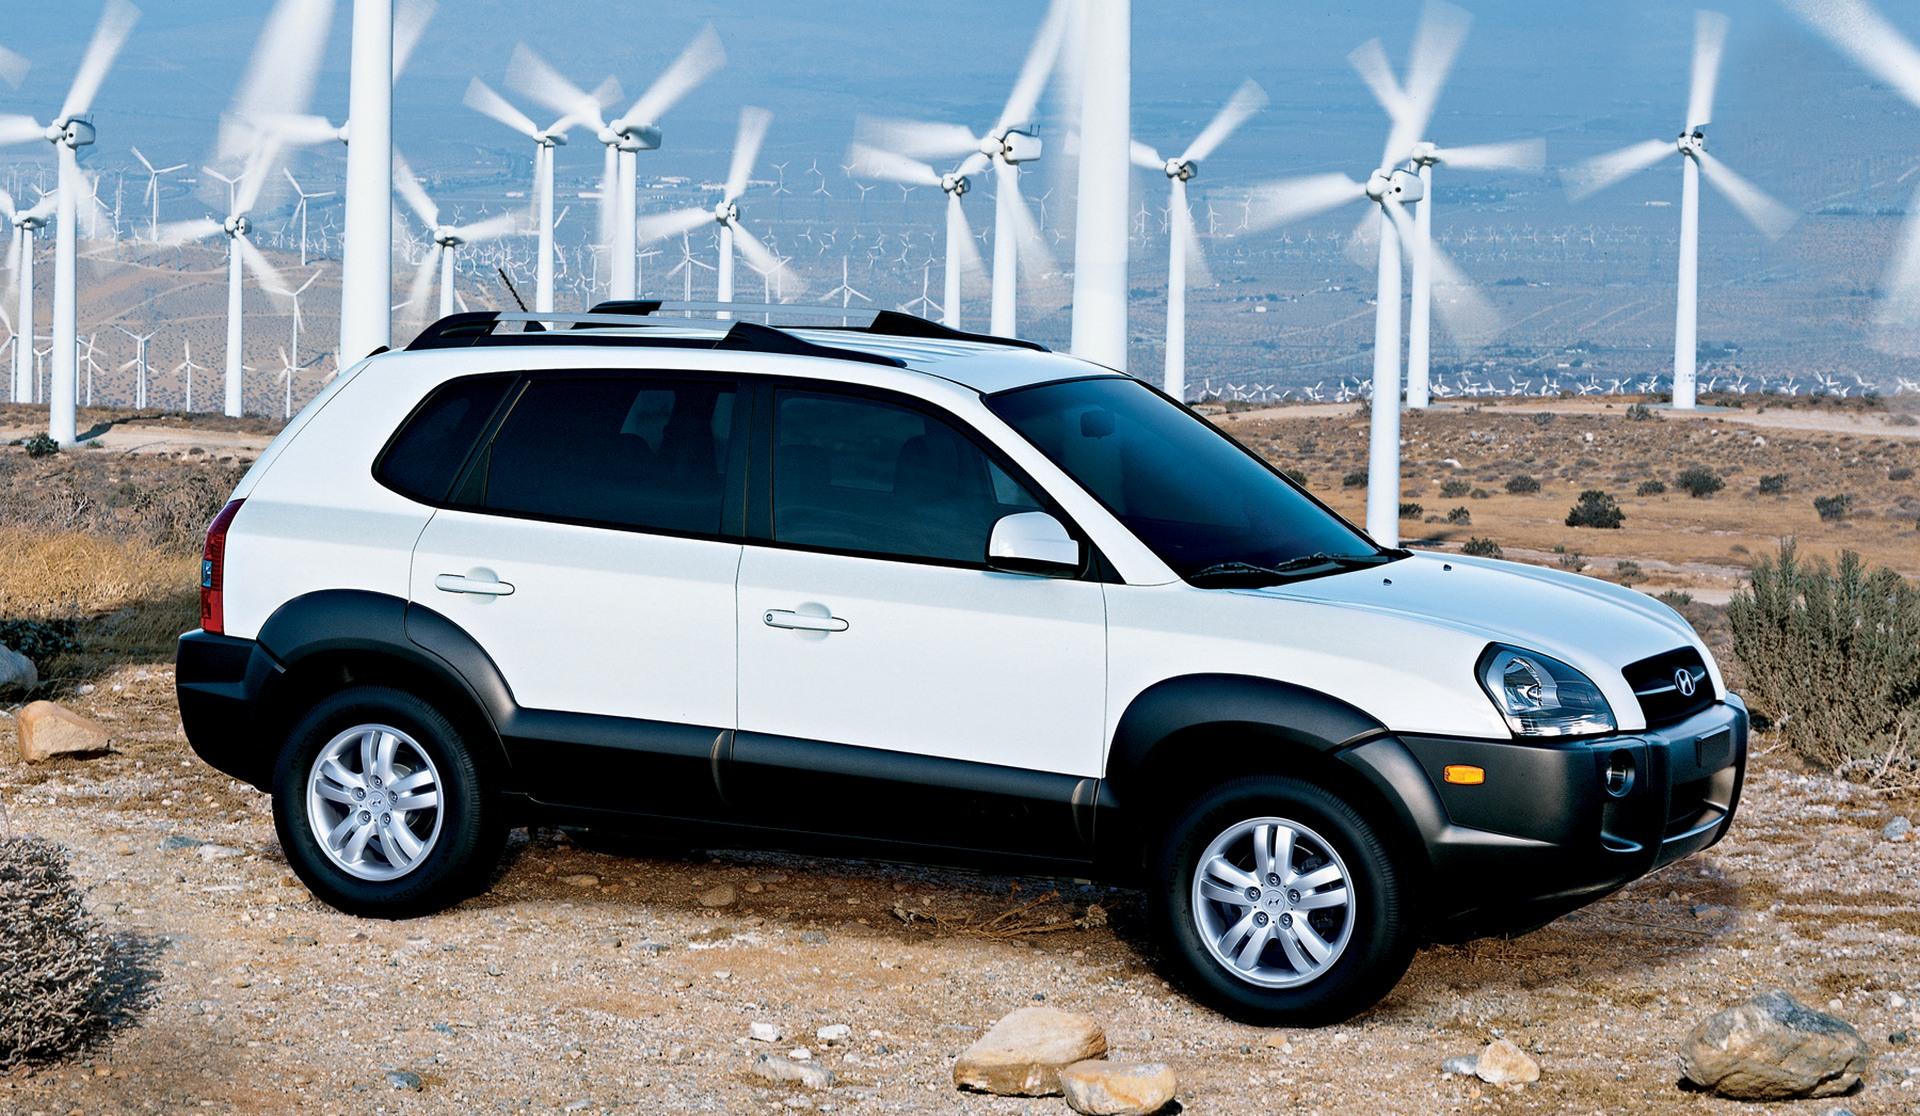 2008 Hyundai Tucson Image